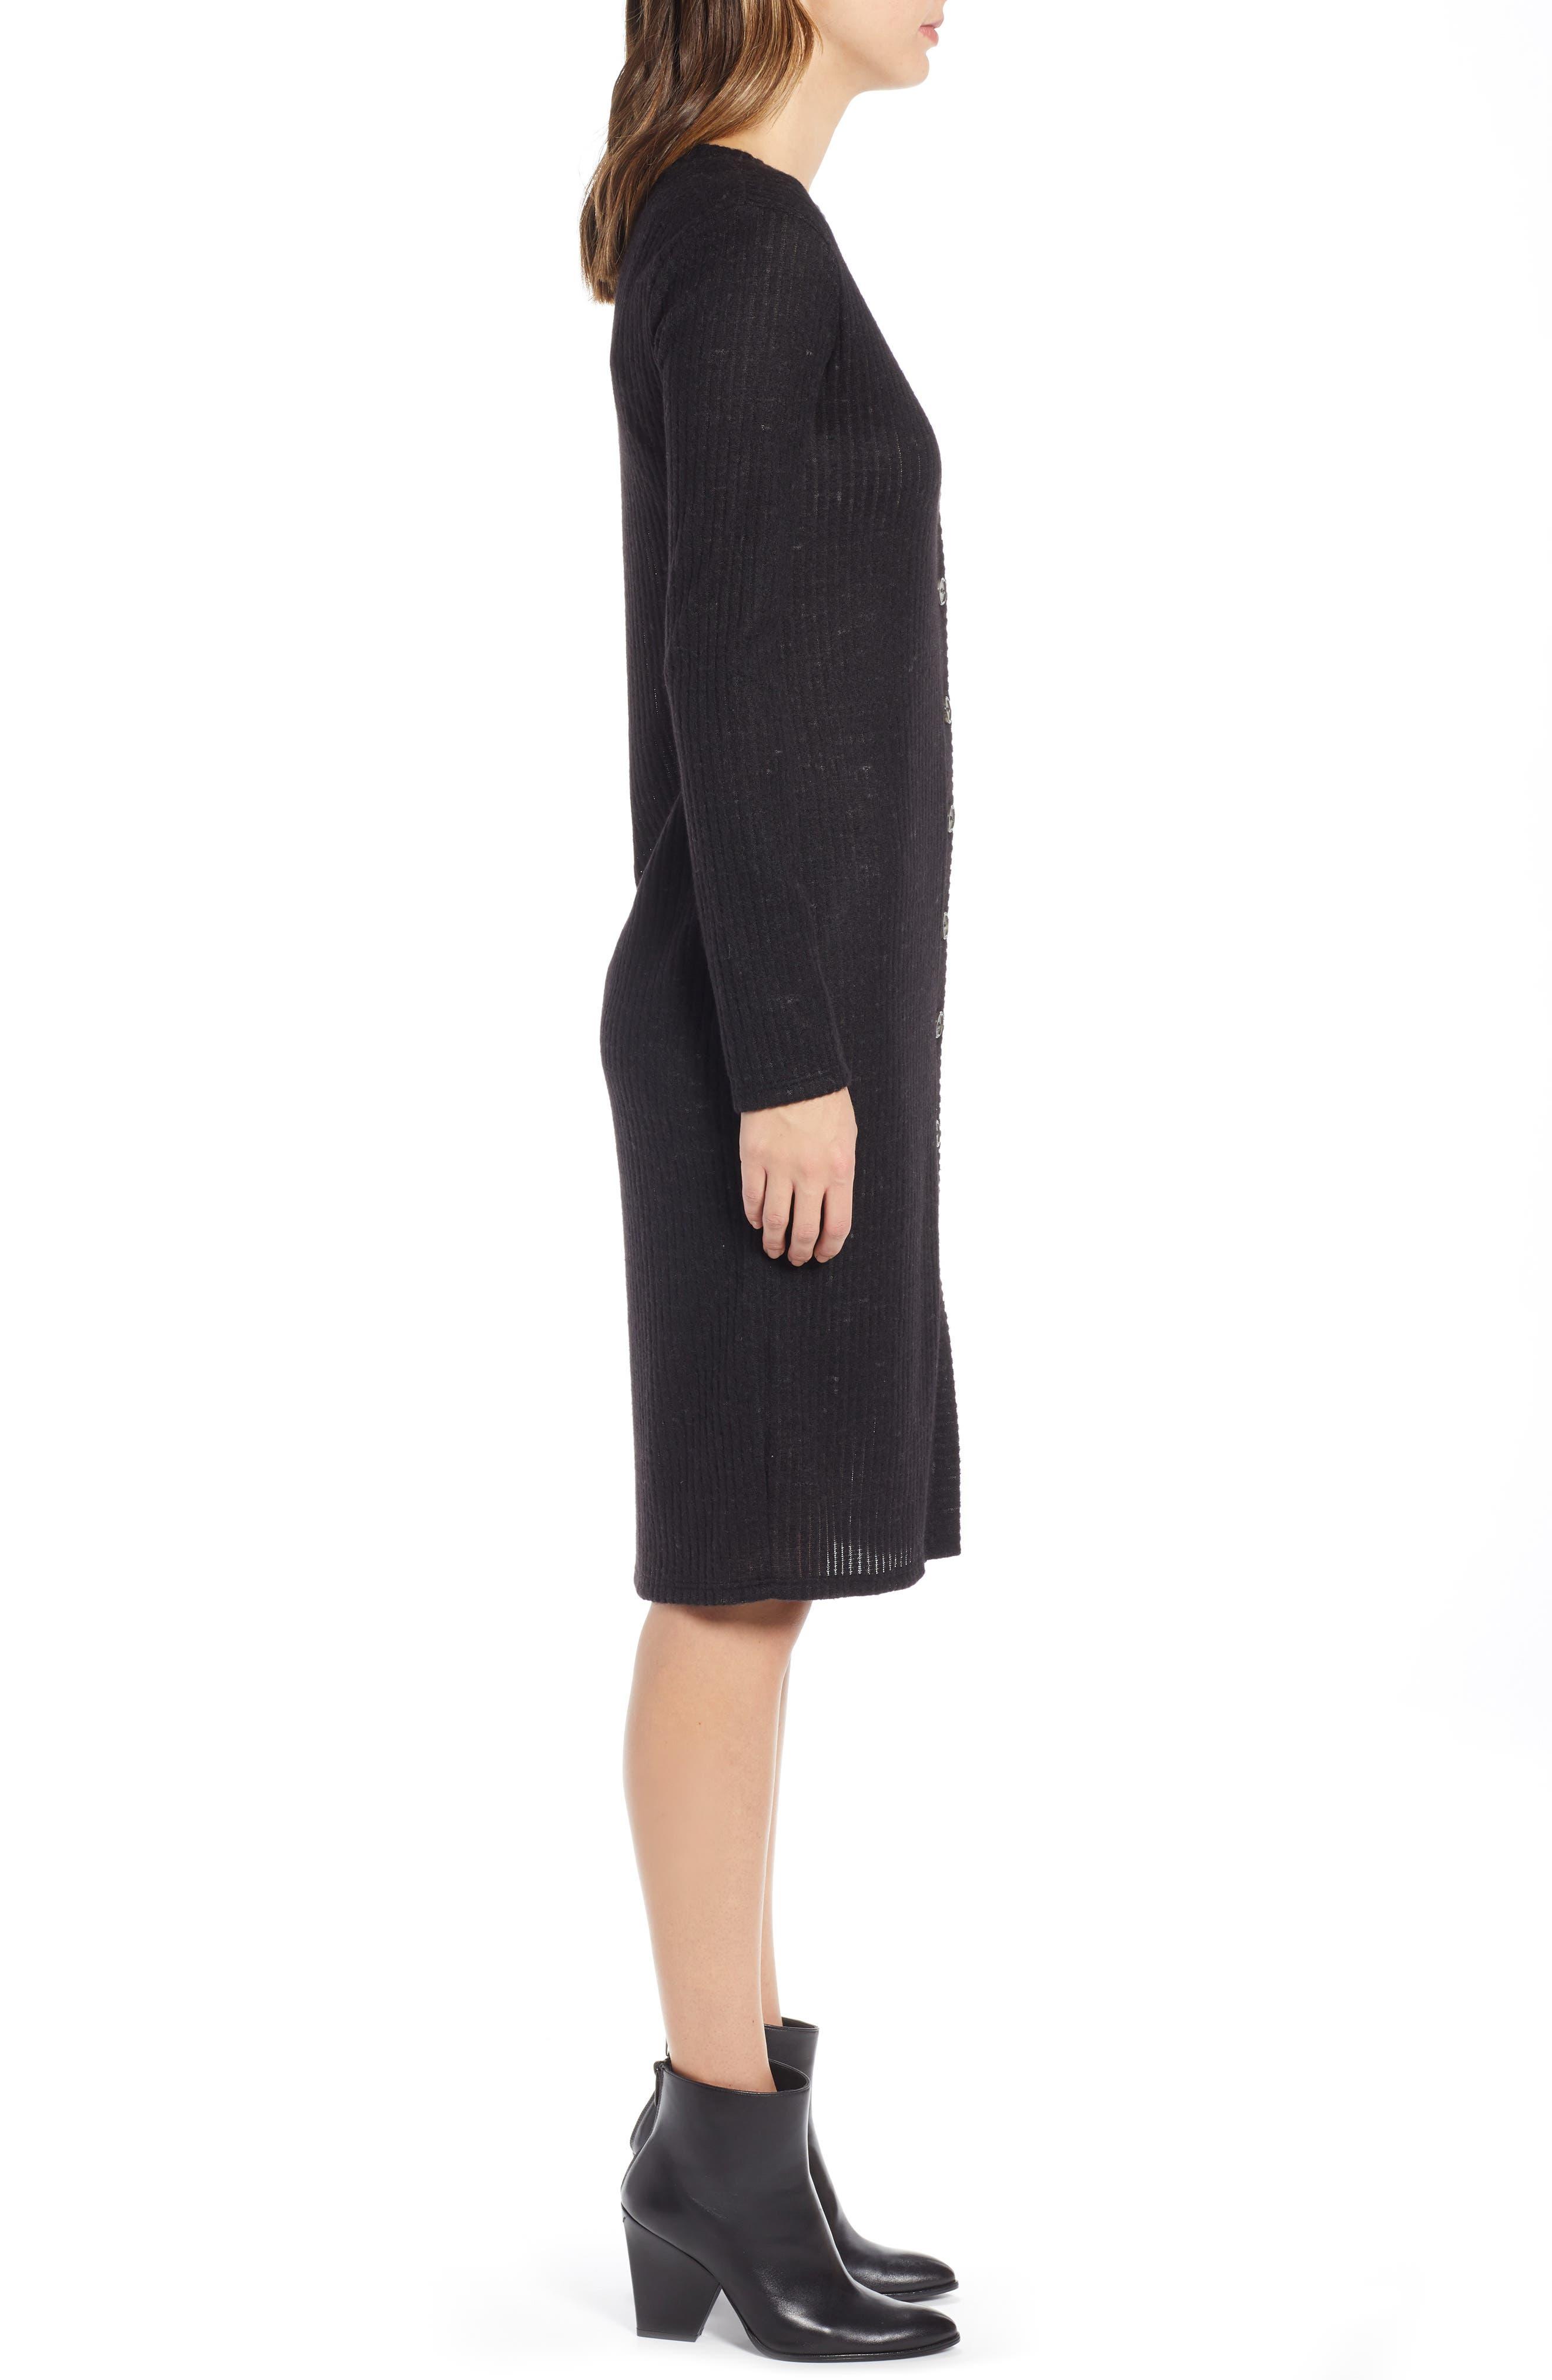 SOCIALITE,                             Sweater Dress,                             Alternate thumbnail 4, color,                             BLACK